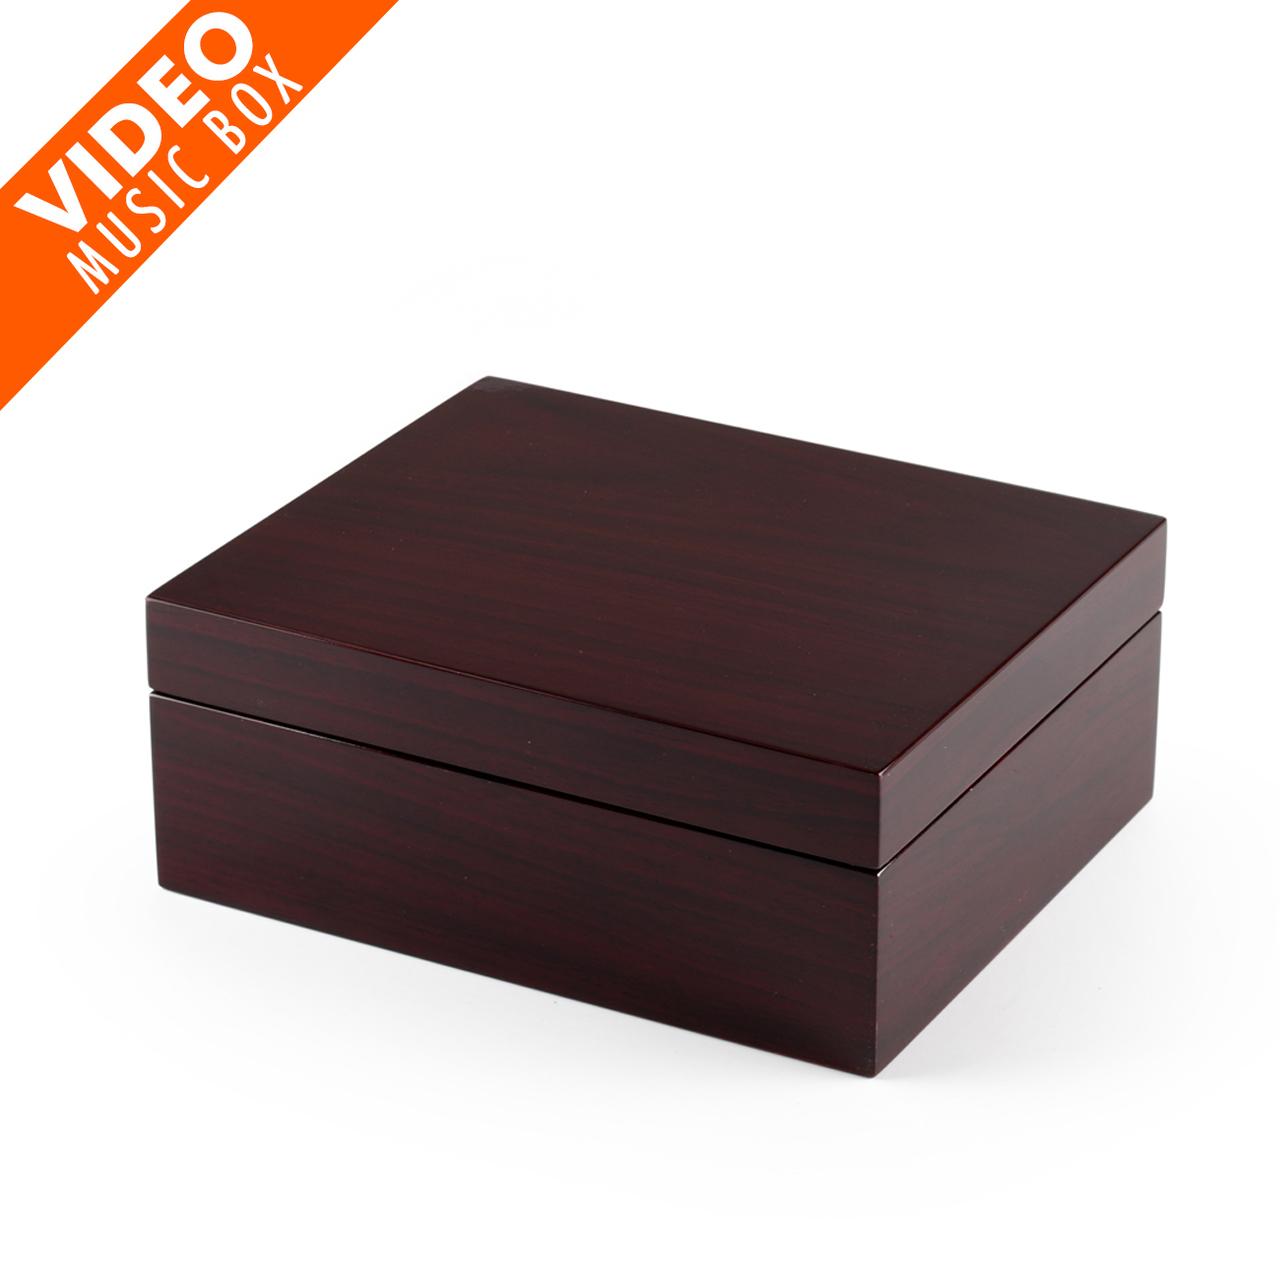 Contemporary Hi Gloss Walnut Finish 5 LCD Video Jewelry Box